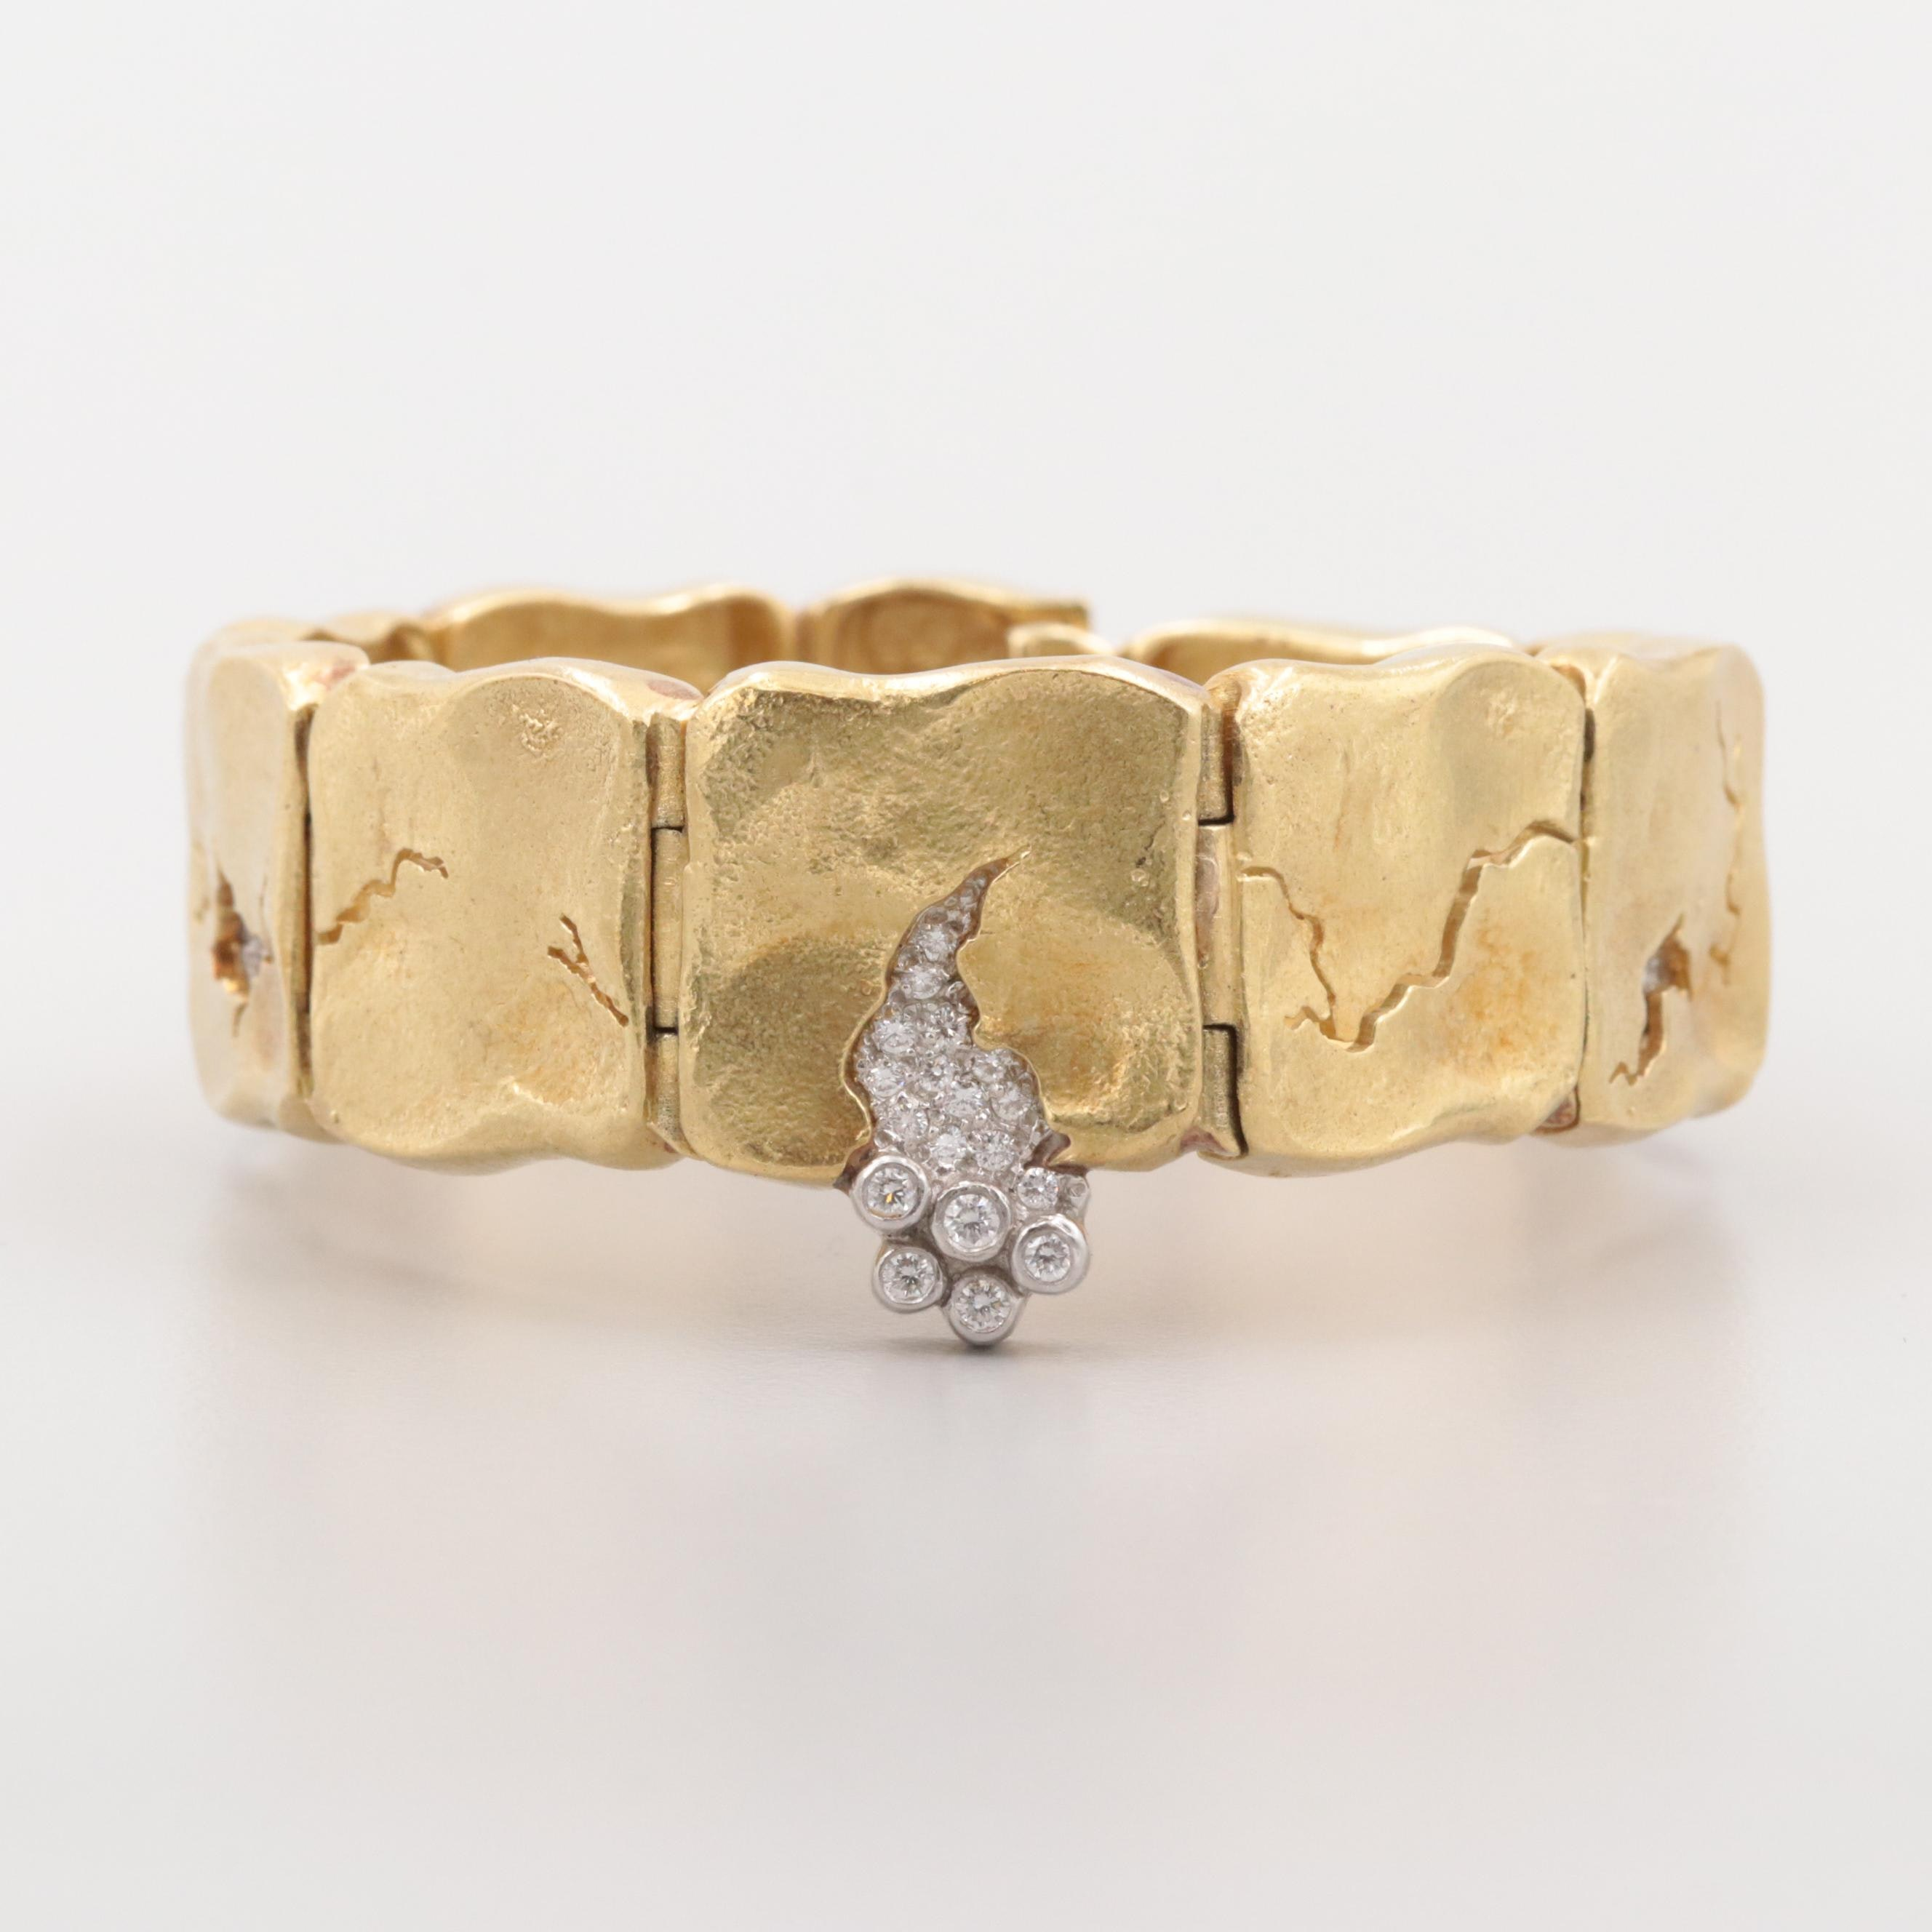 "Seidengang ""Odyssey"" Collection 18K Yellow Gold and Platinum Diamond Bracelet"